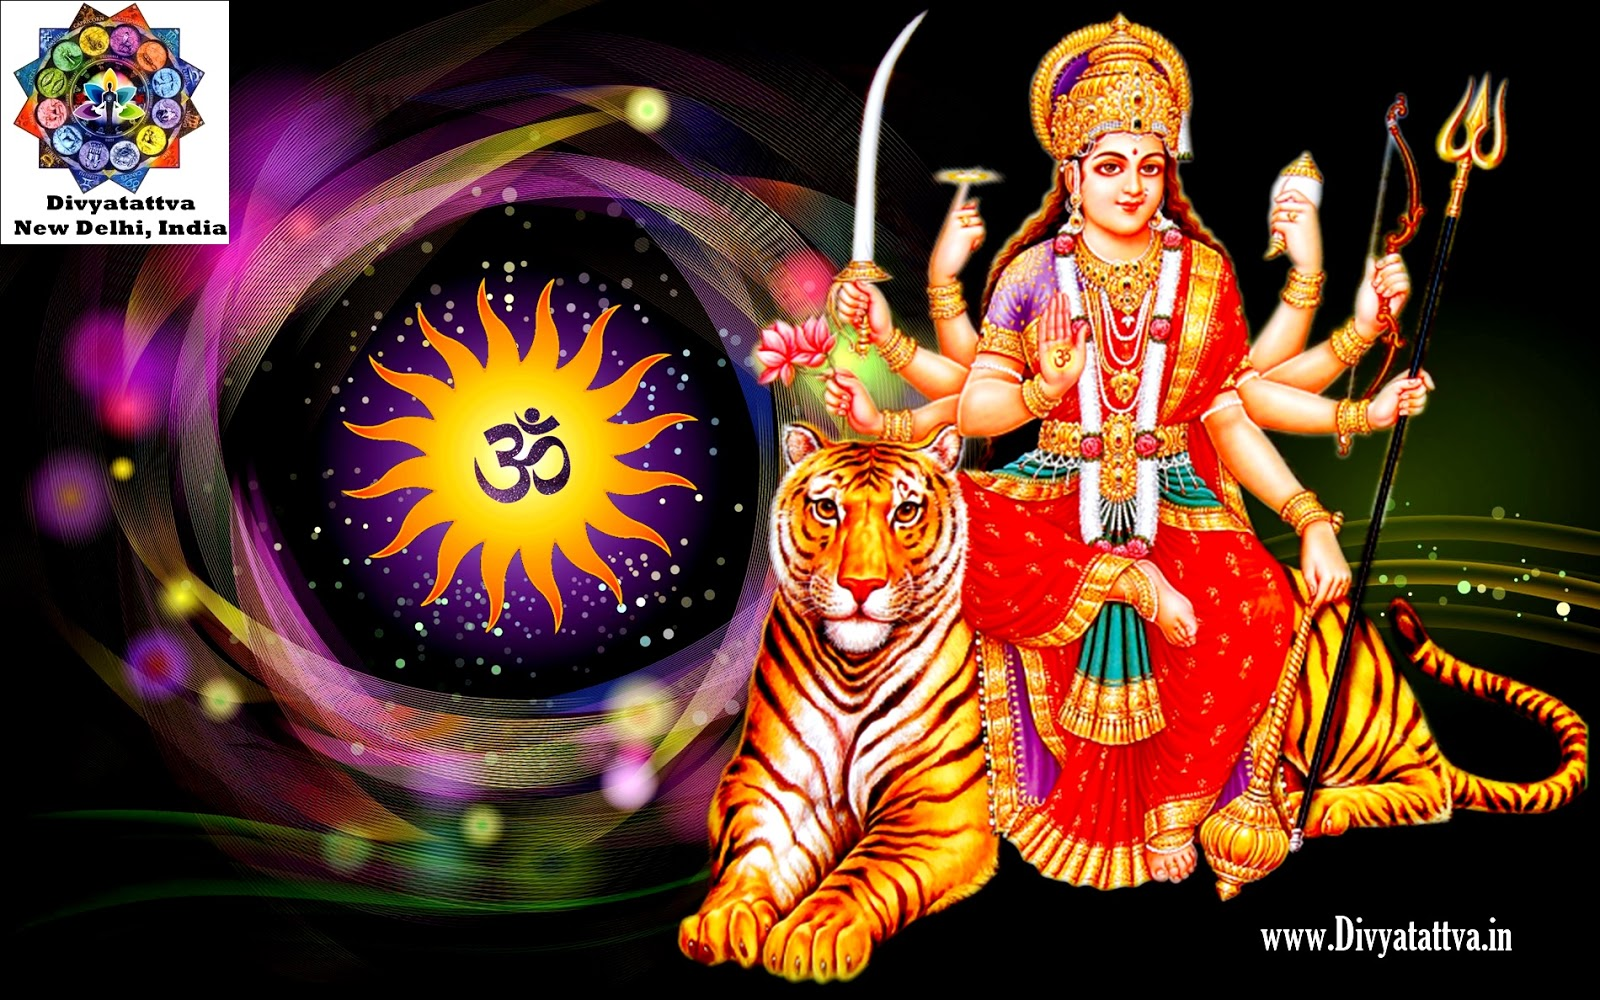 divyatattva astrology free horoscopes psychic tarot yoga tantra occult images videos durga goddess hd wallpaper maa durga best images free download durga goddess hd wallpaper maa durga